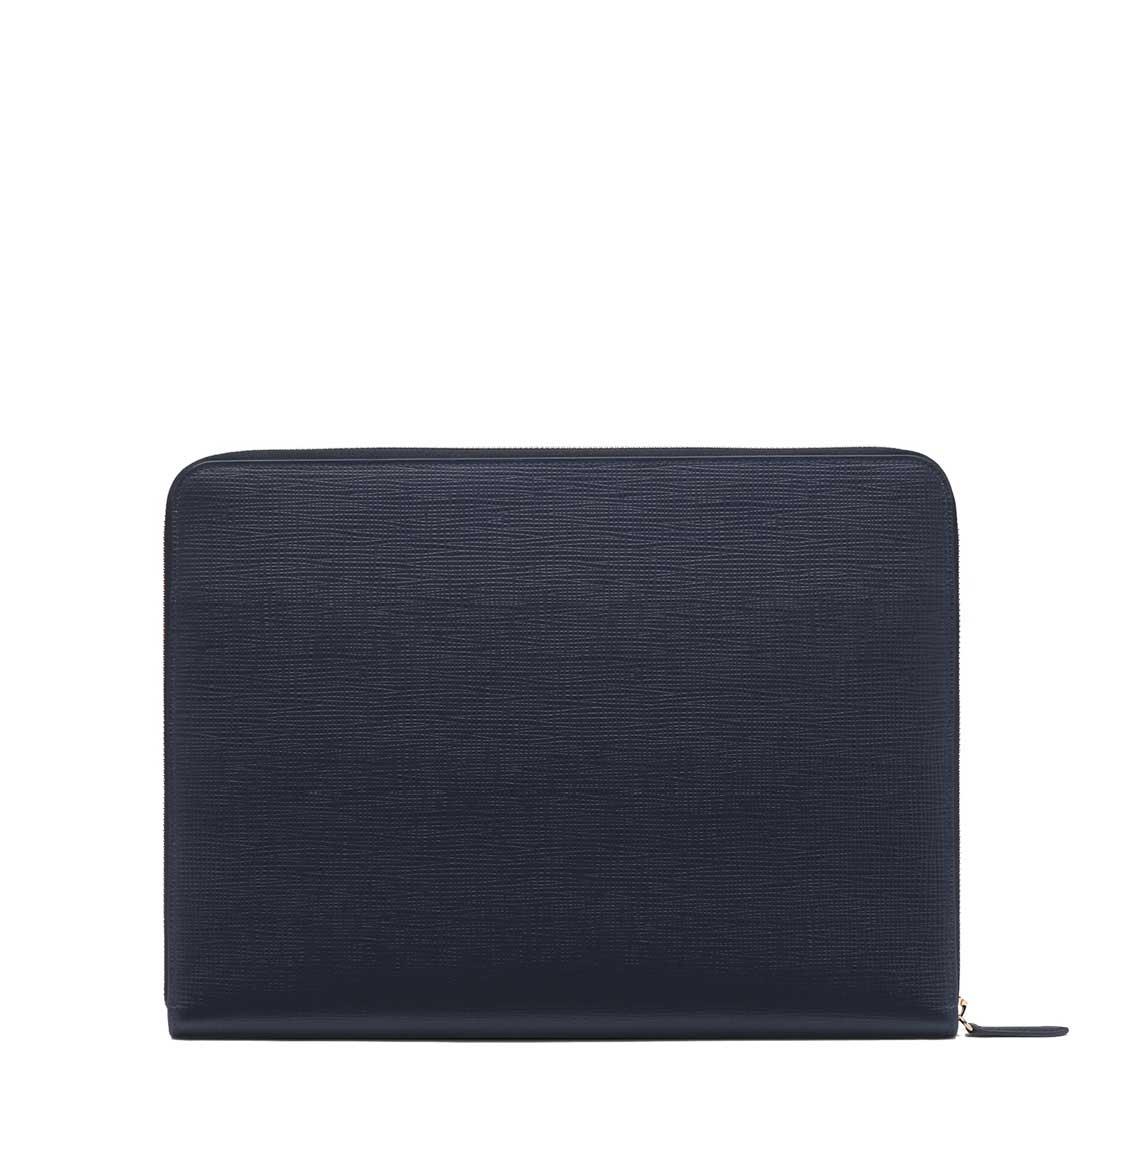 Smythson Panama Cross-Grain Leather Folio With Pocket Deep Blue